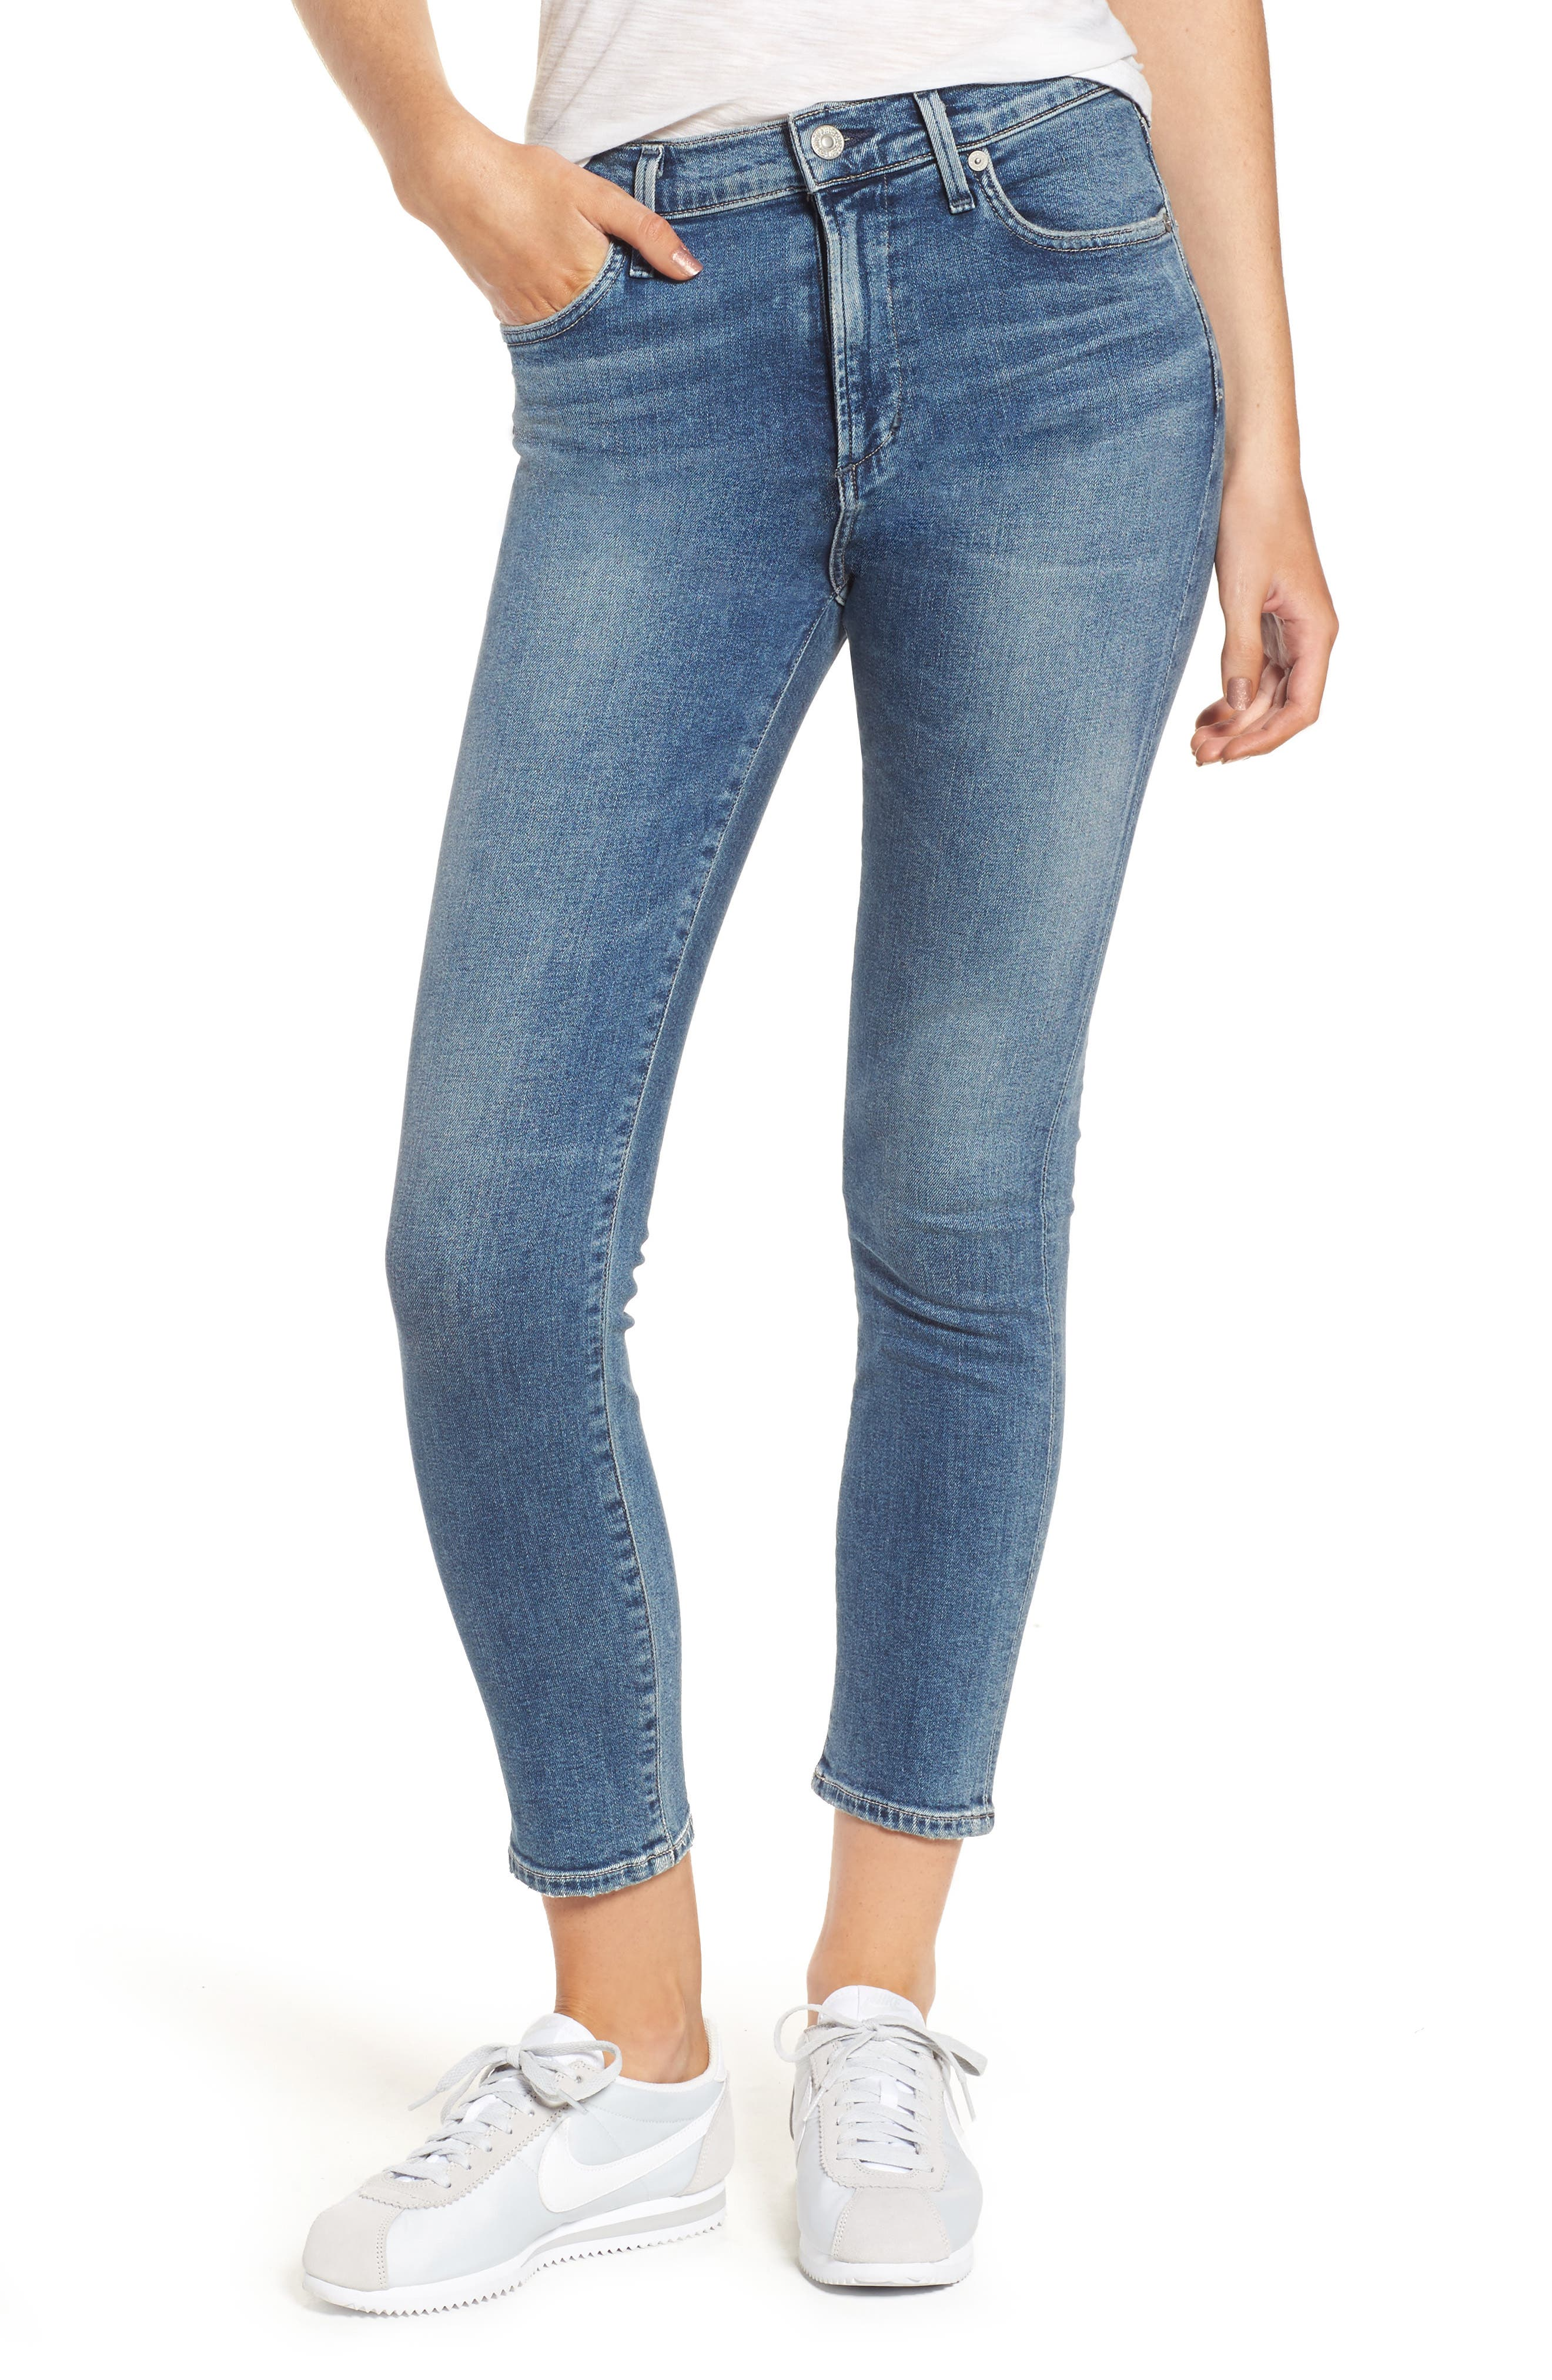 Rocket Crop Skinny Jeans,                             Main thumbnail 1, color,                             Orbit